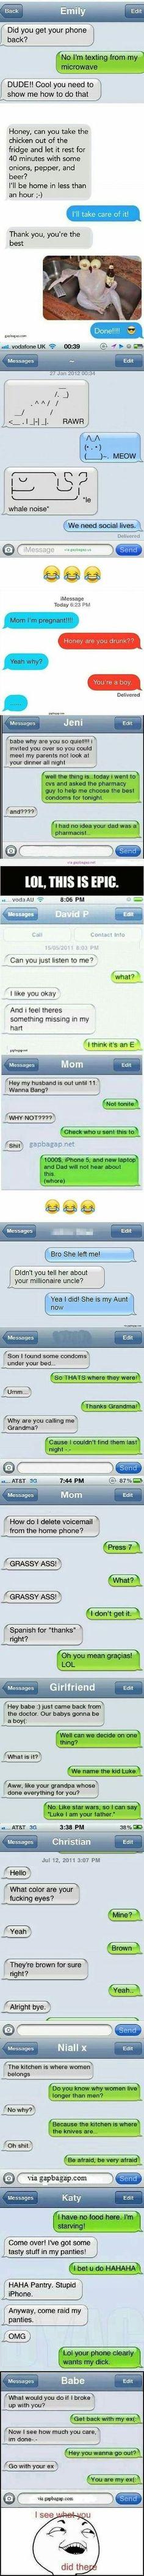 Top 15 Hilarious Text Messages